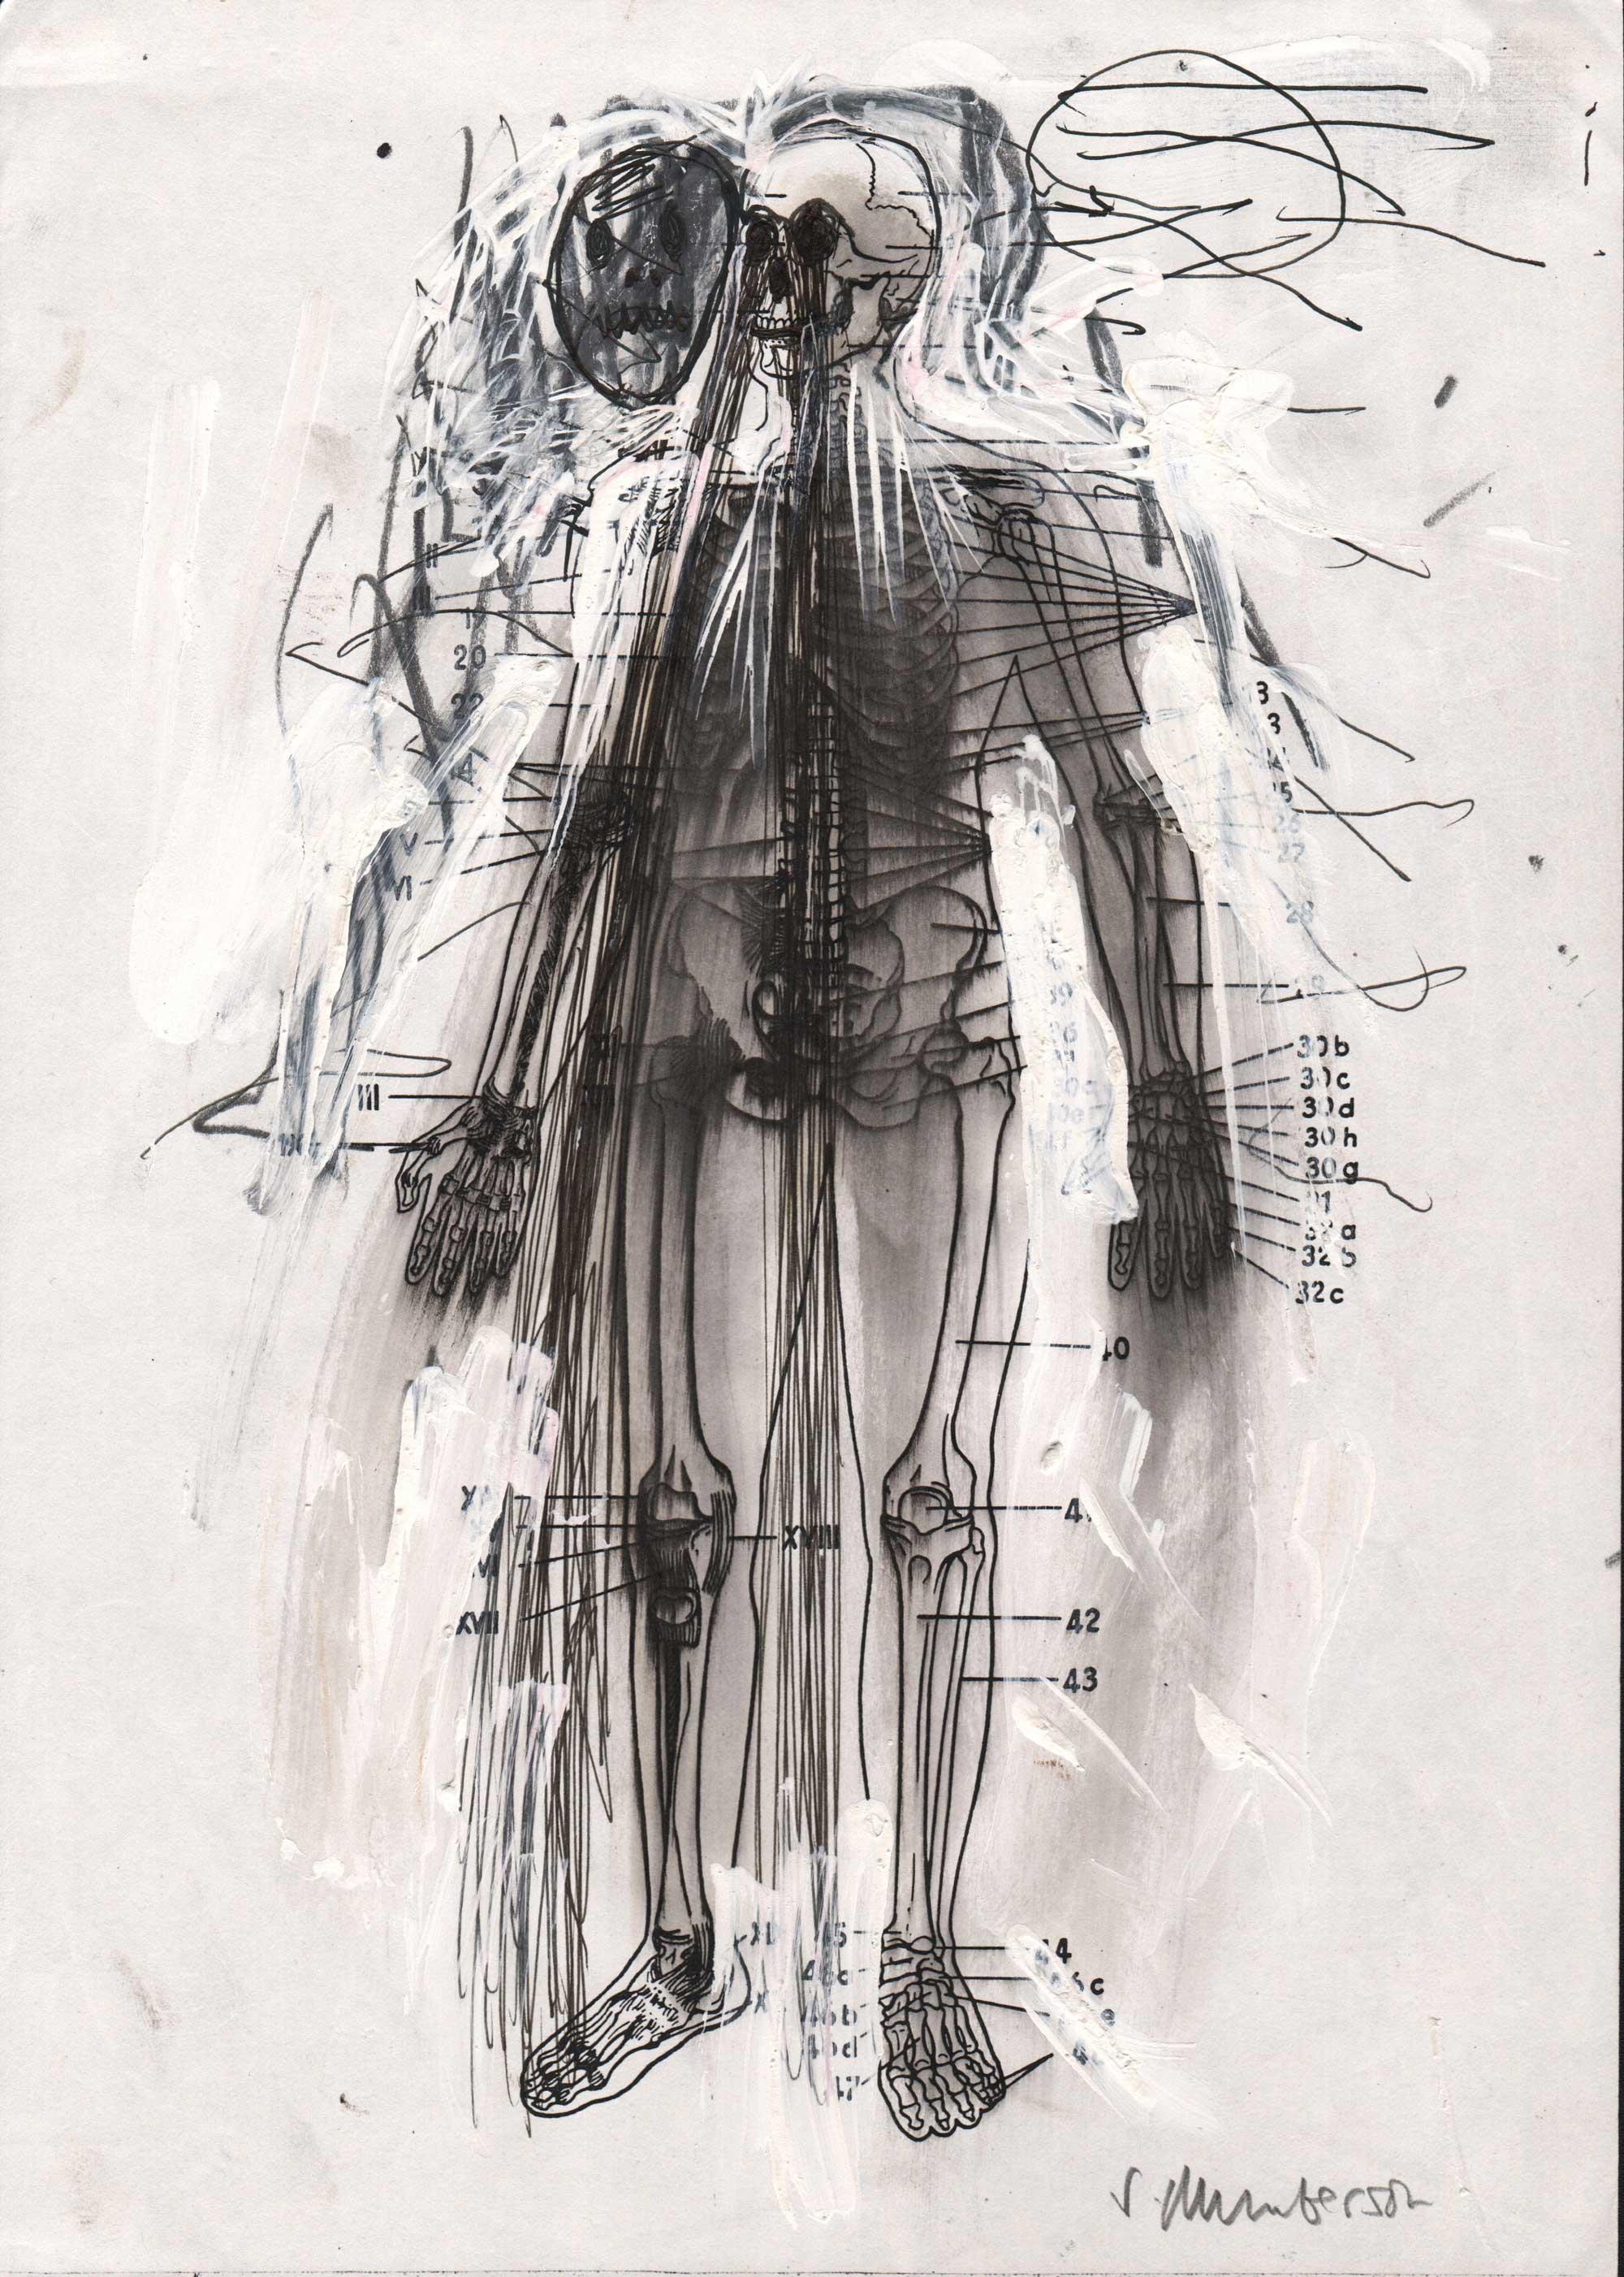 Stephen MUMBERSON (1955) UK, New Human 7, 2014, Pencil, 20,5 x 21 cm